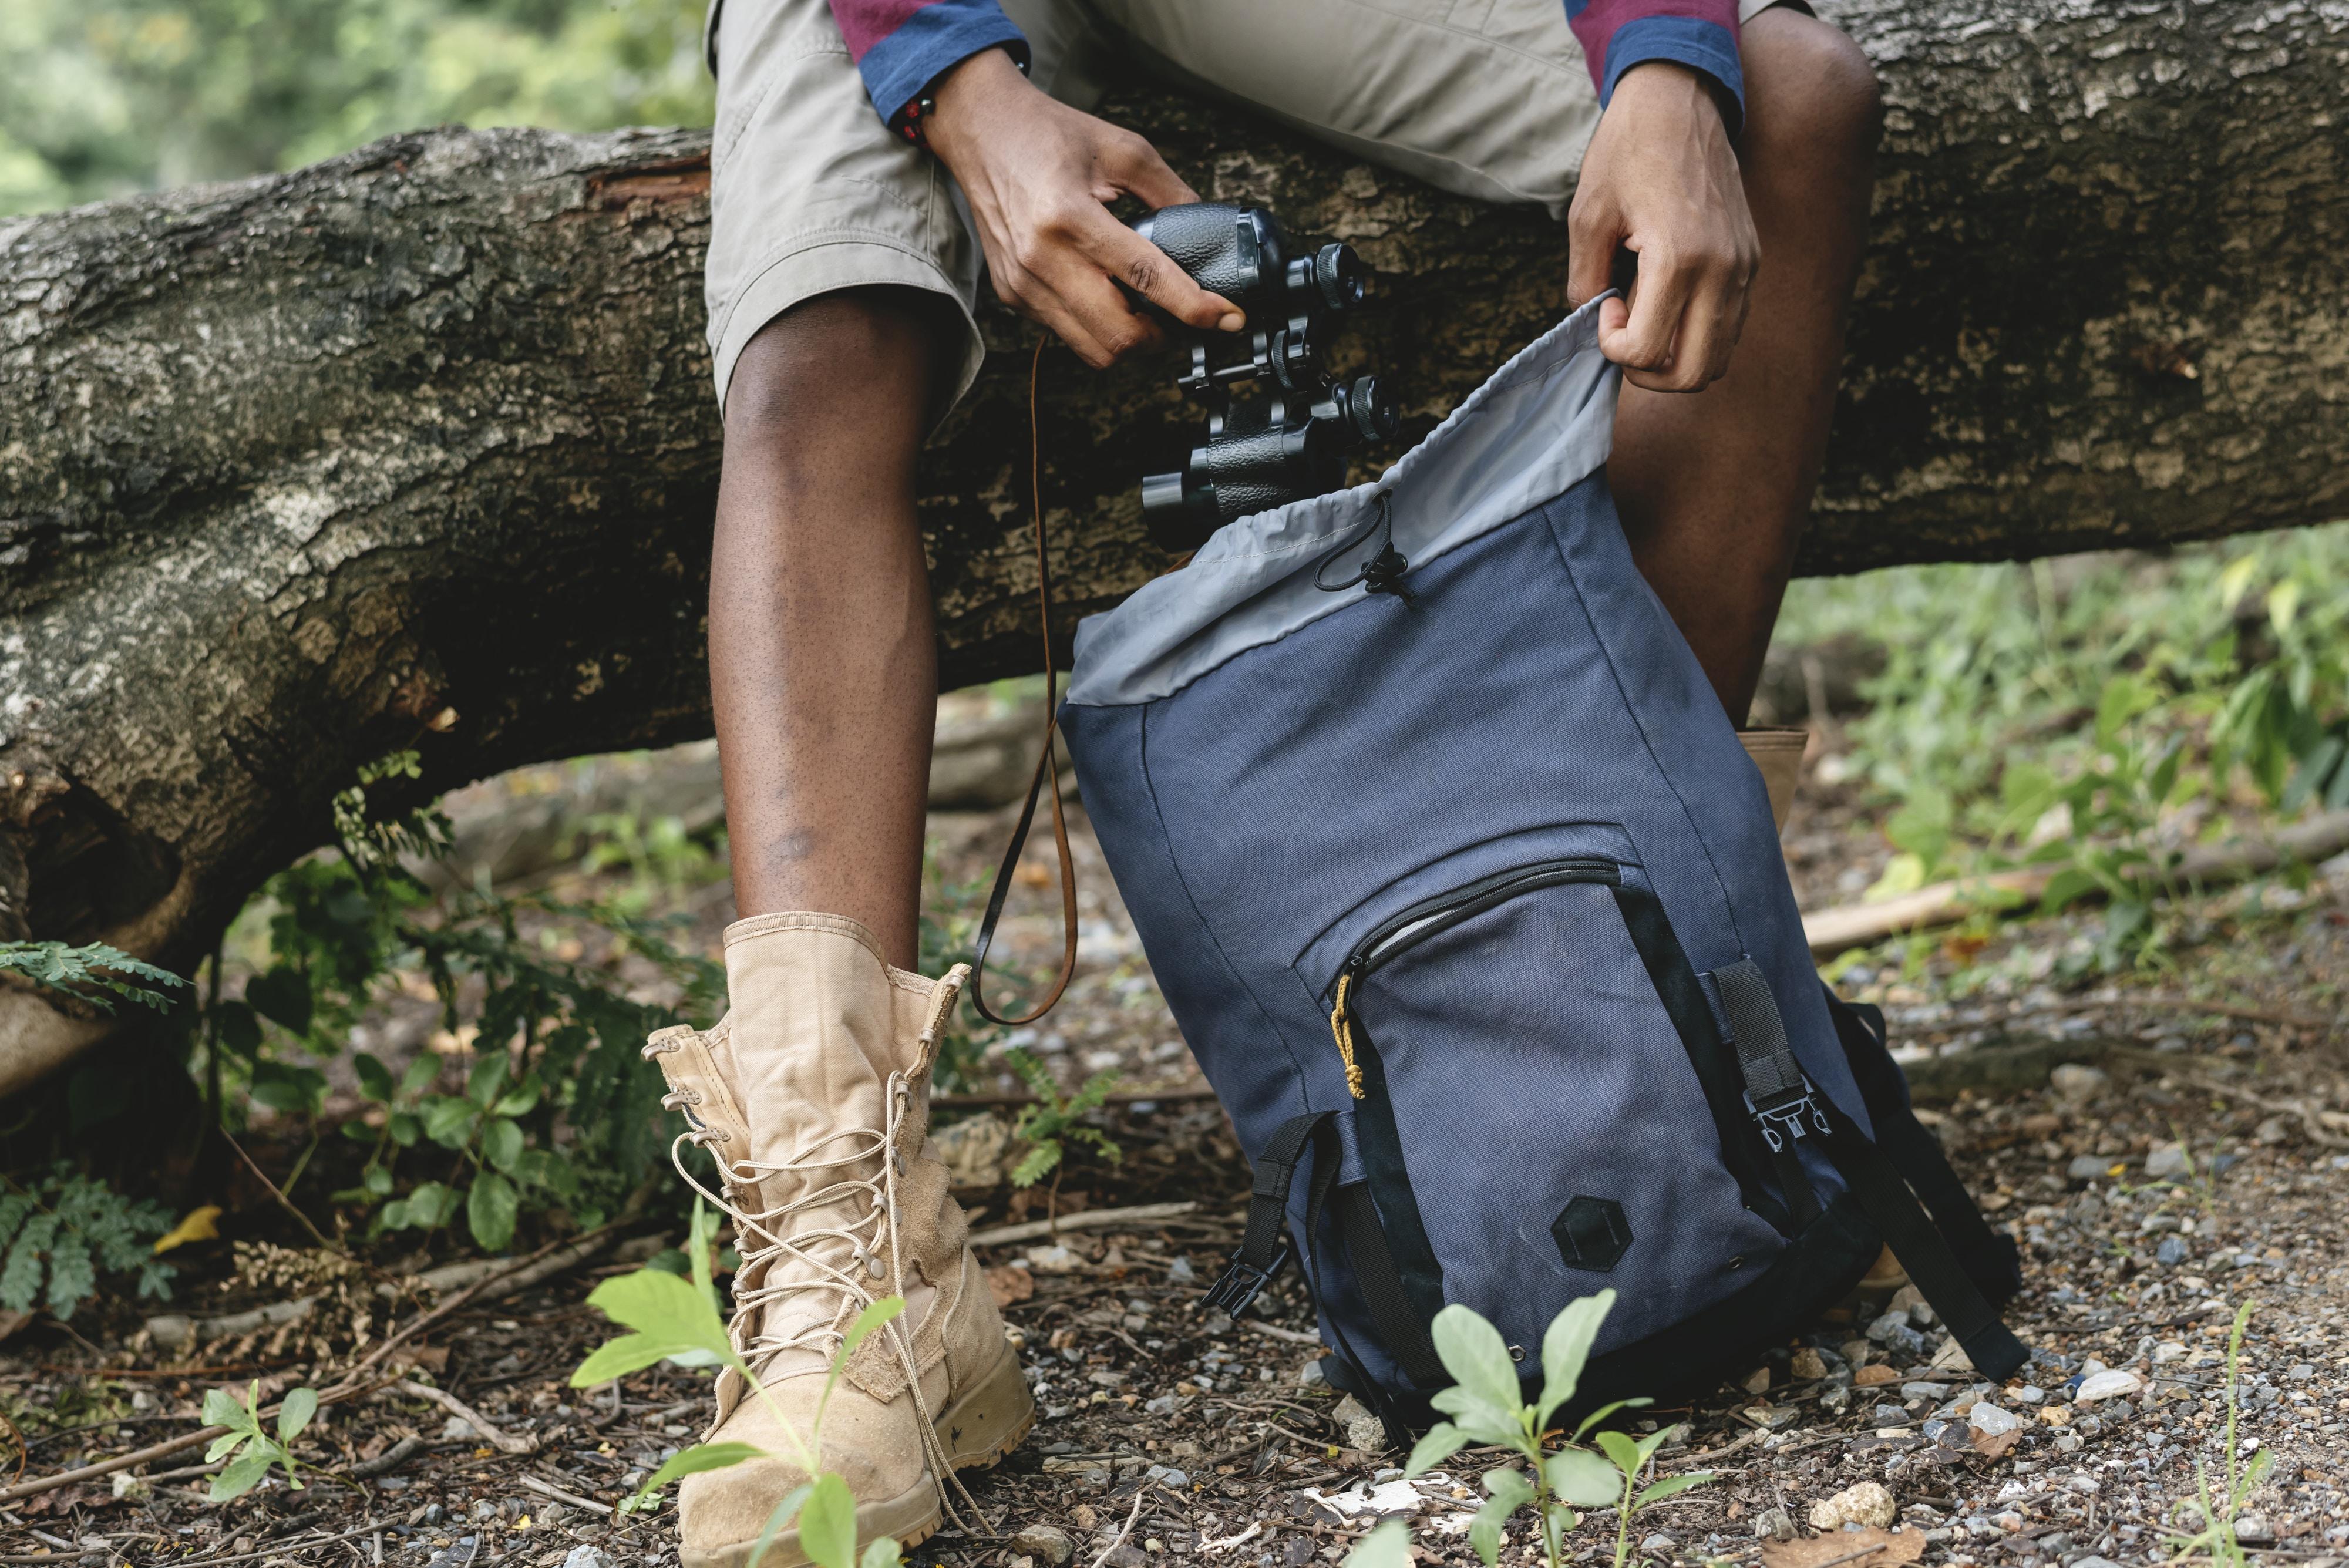 man holding black camera and gray camping backpack